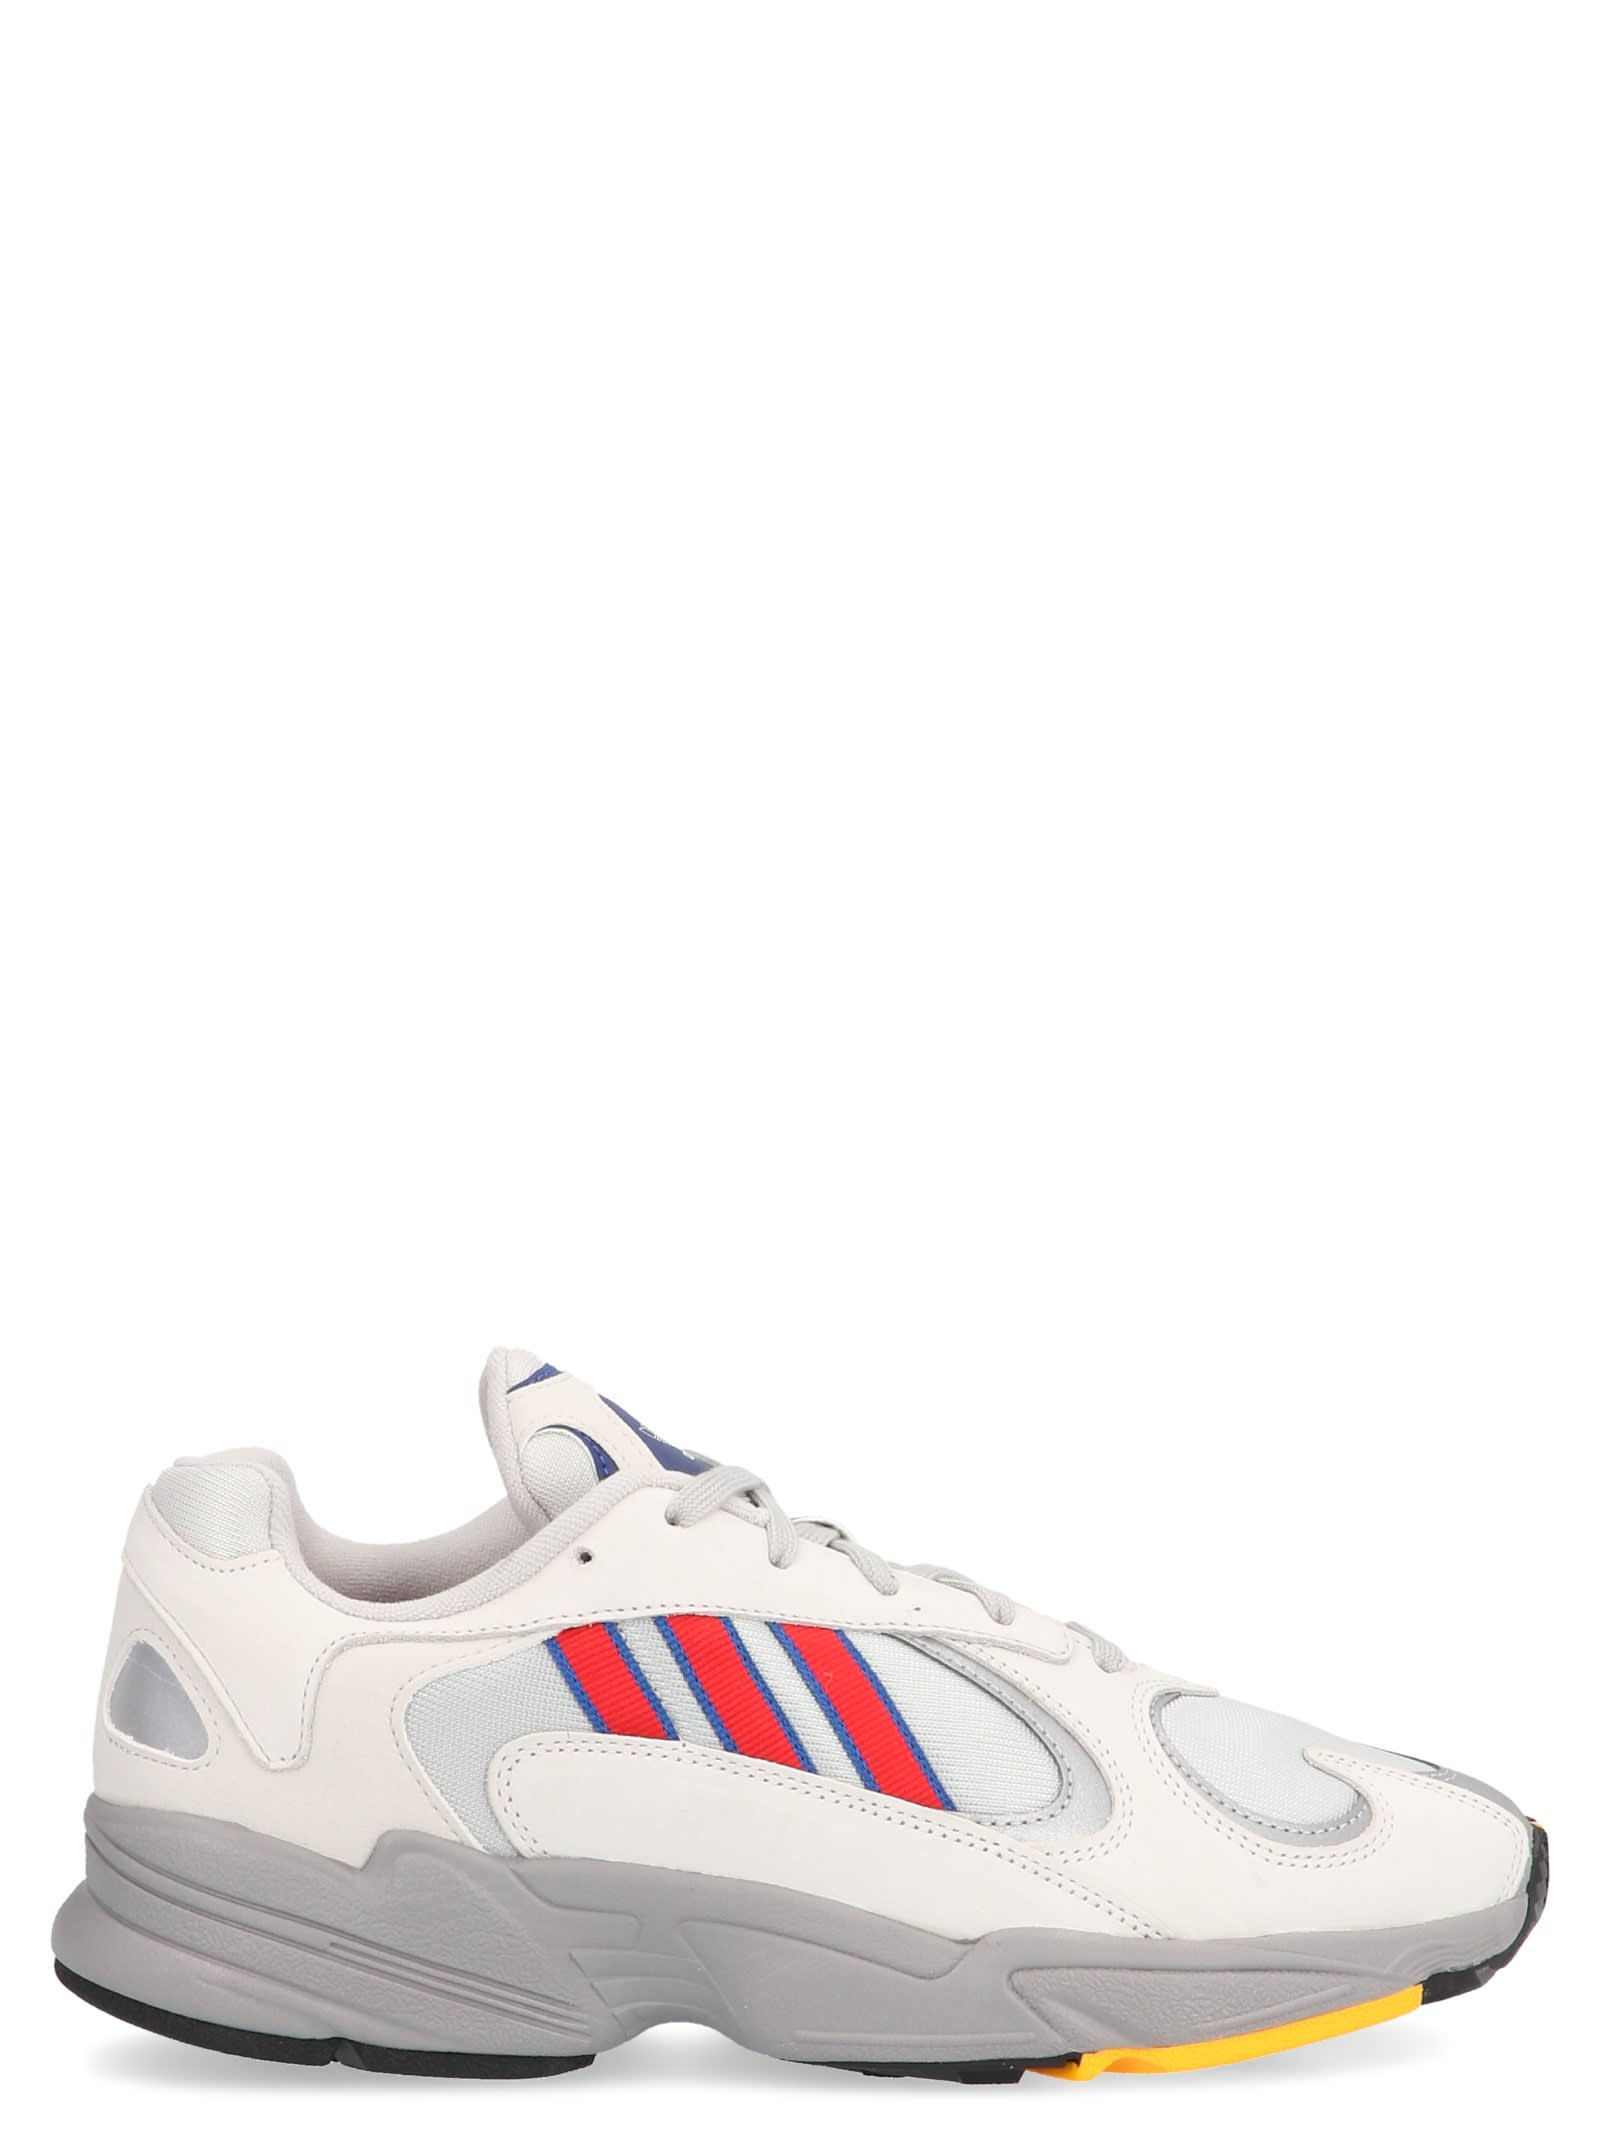 Best price on the market at italist | Adidas Originals Adidas Originals 'yung 1' Shoes